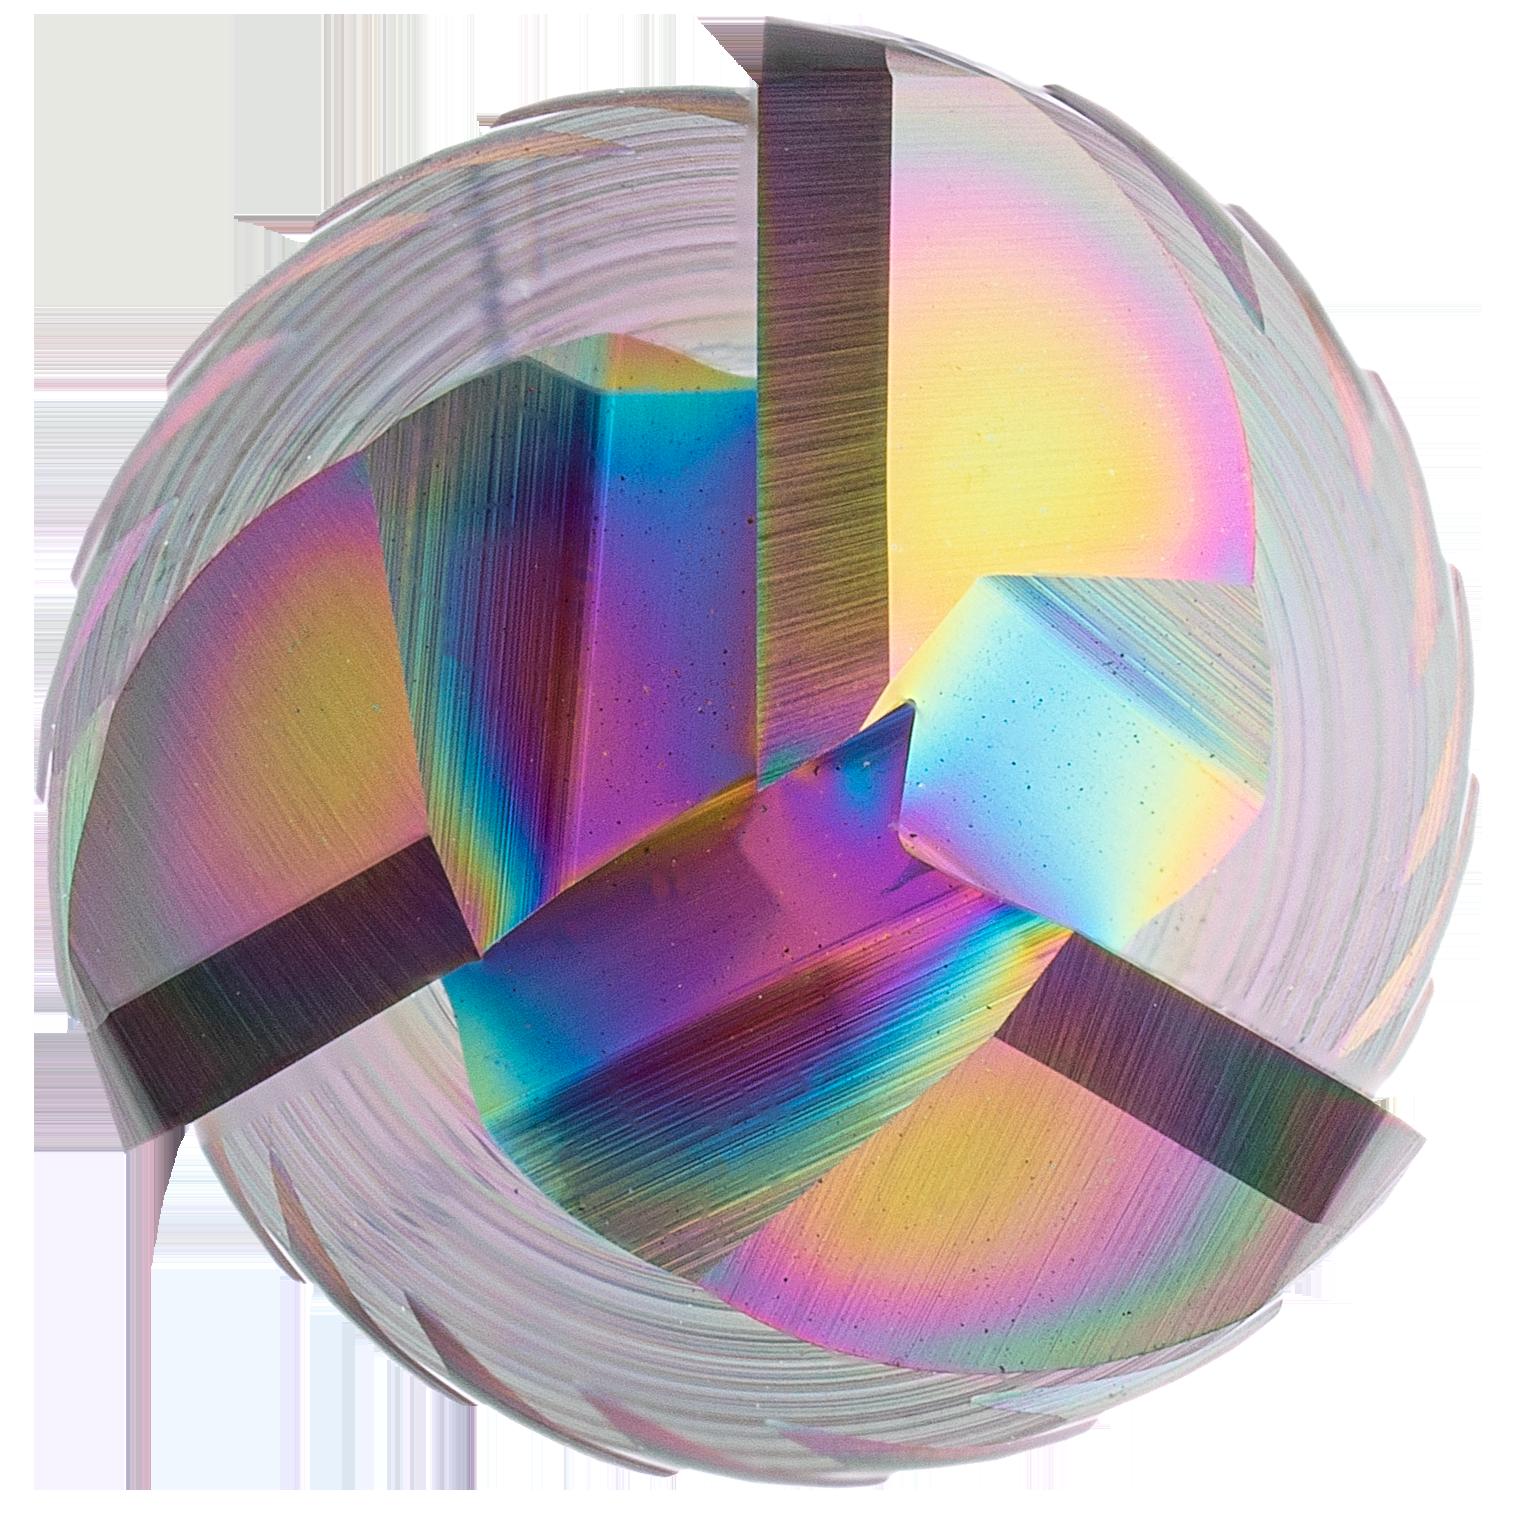 EXN1-M02-0023